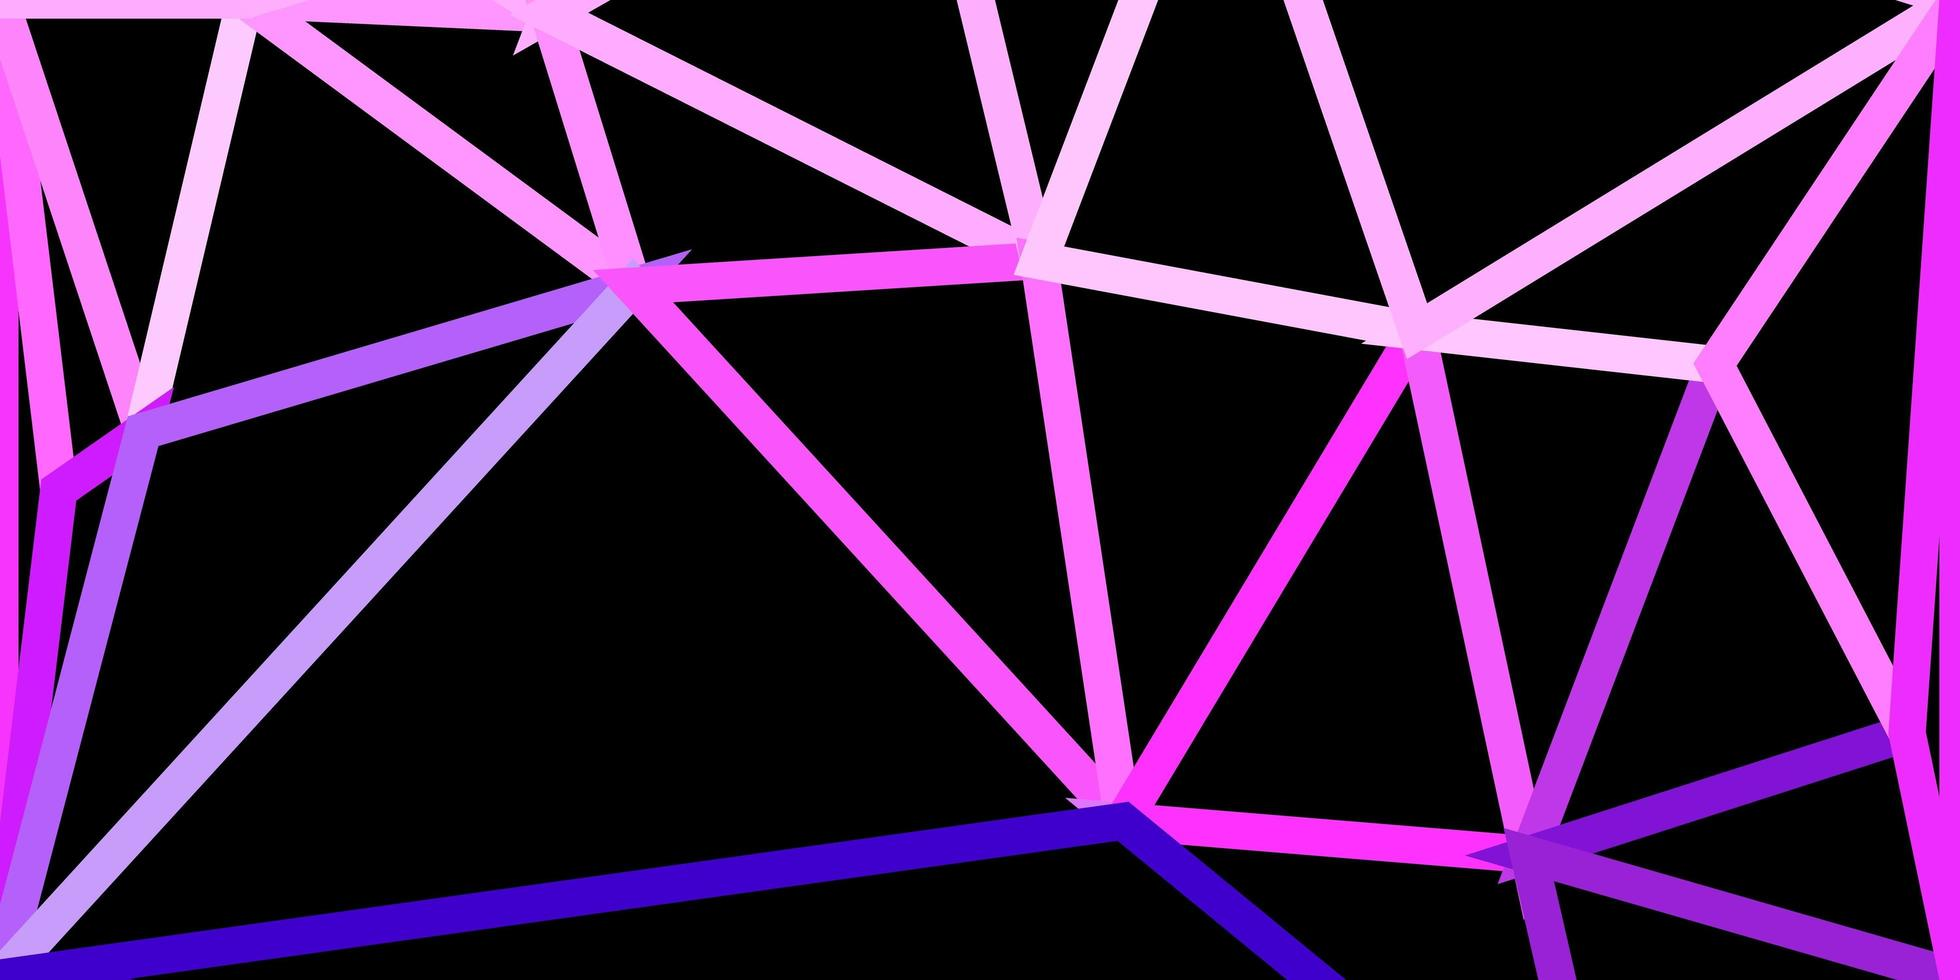 hellrosa Vektor geometrische polygonale Tapete.